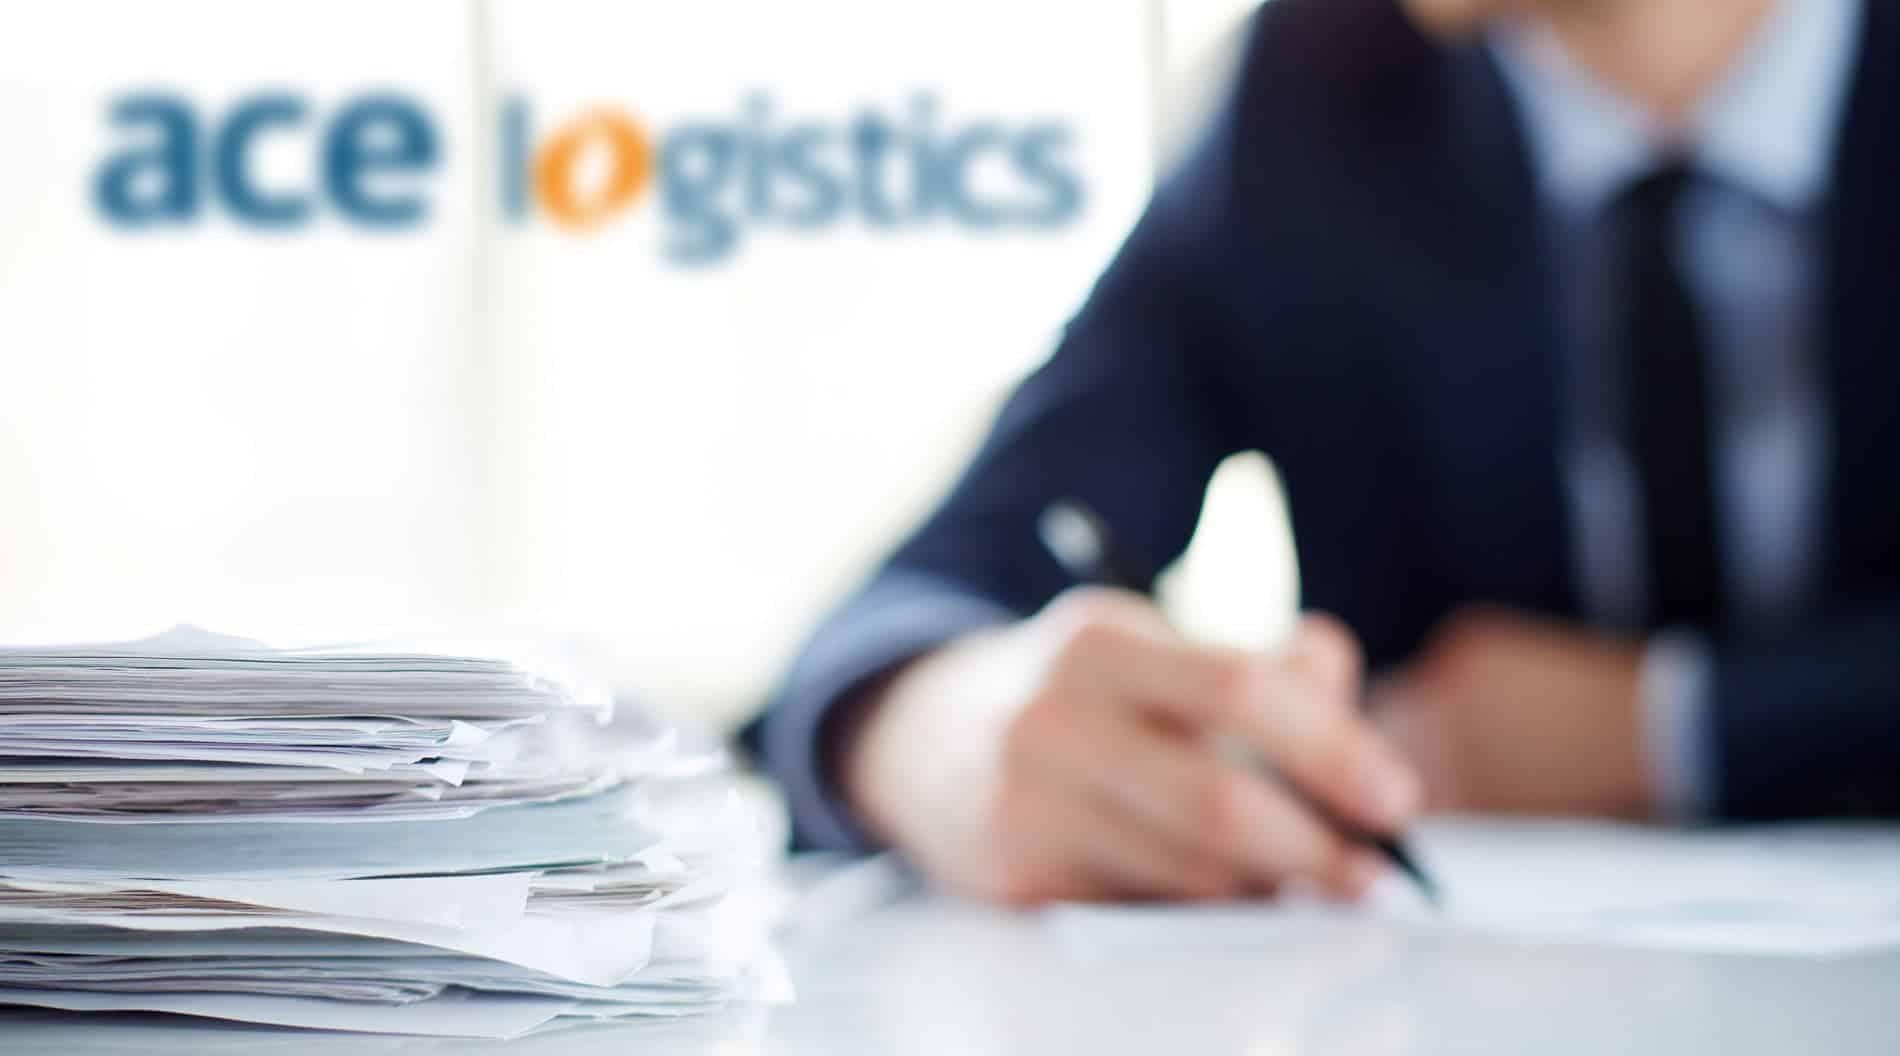 image for ACE logistics services.